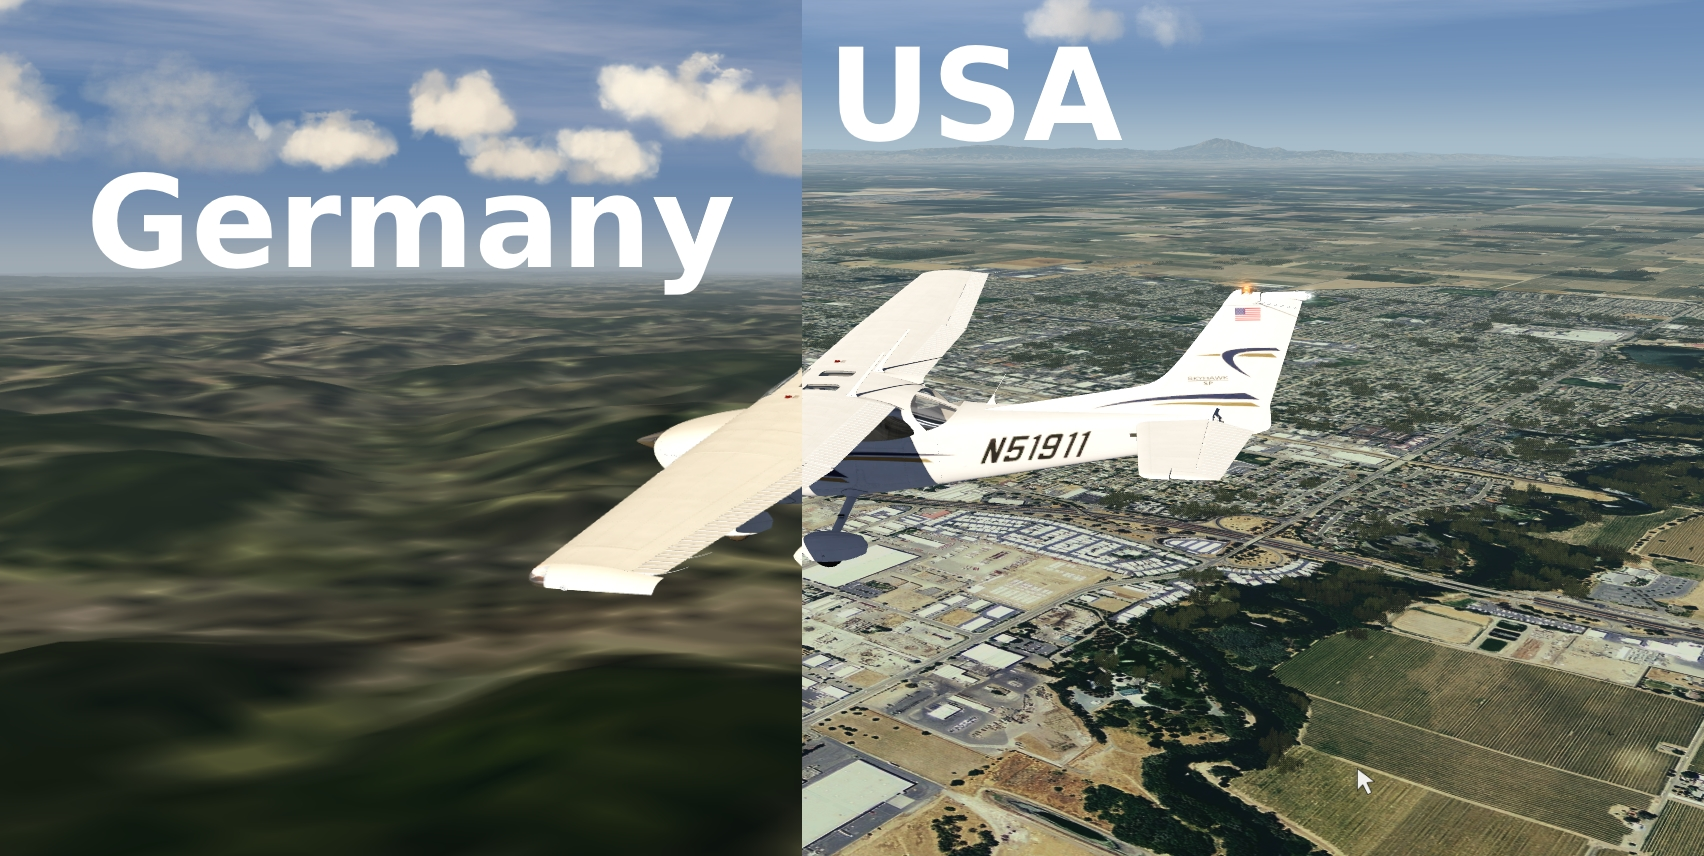 Aerofly FS 2 - Flight Simulation Made In Germany - Dat Sim Blog